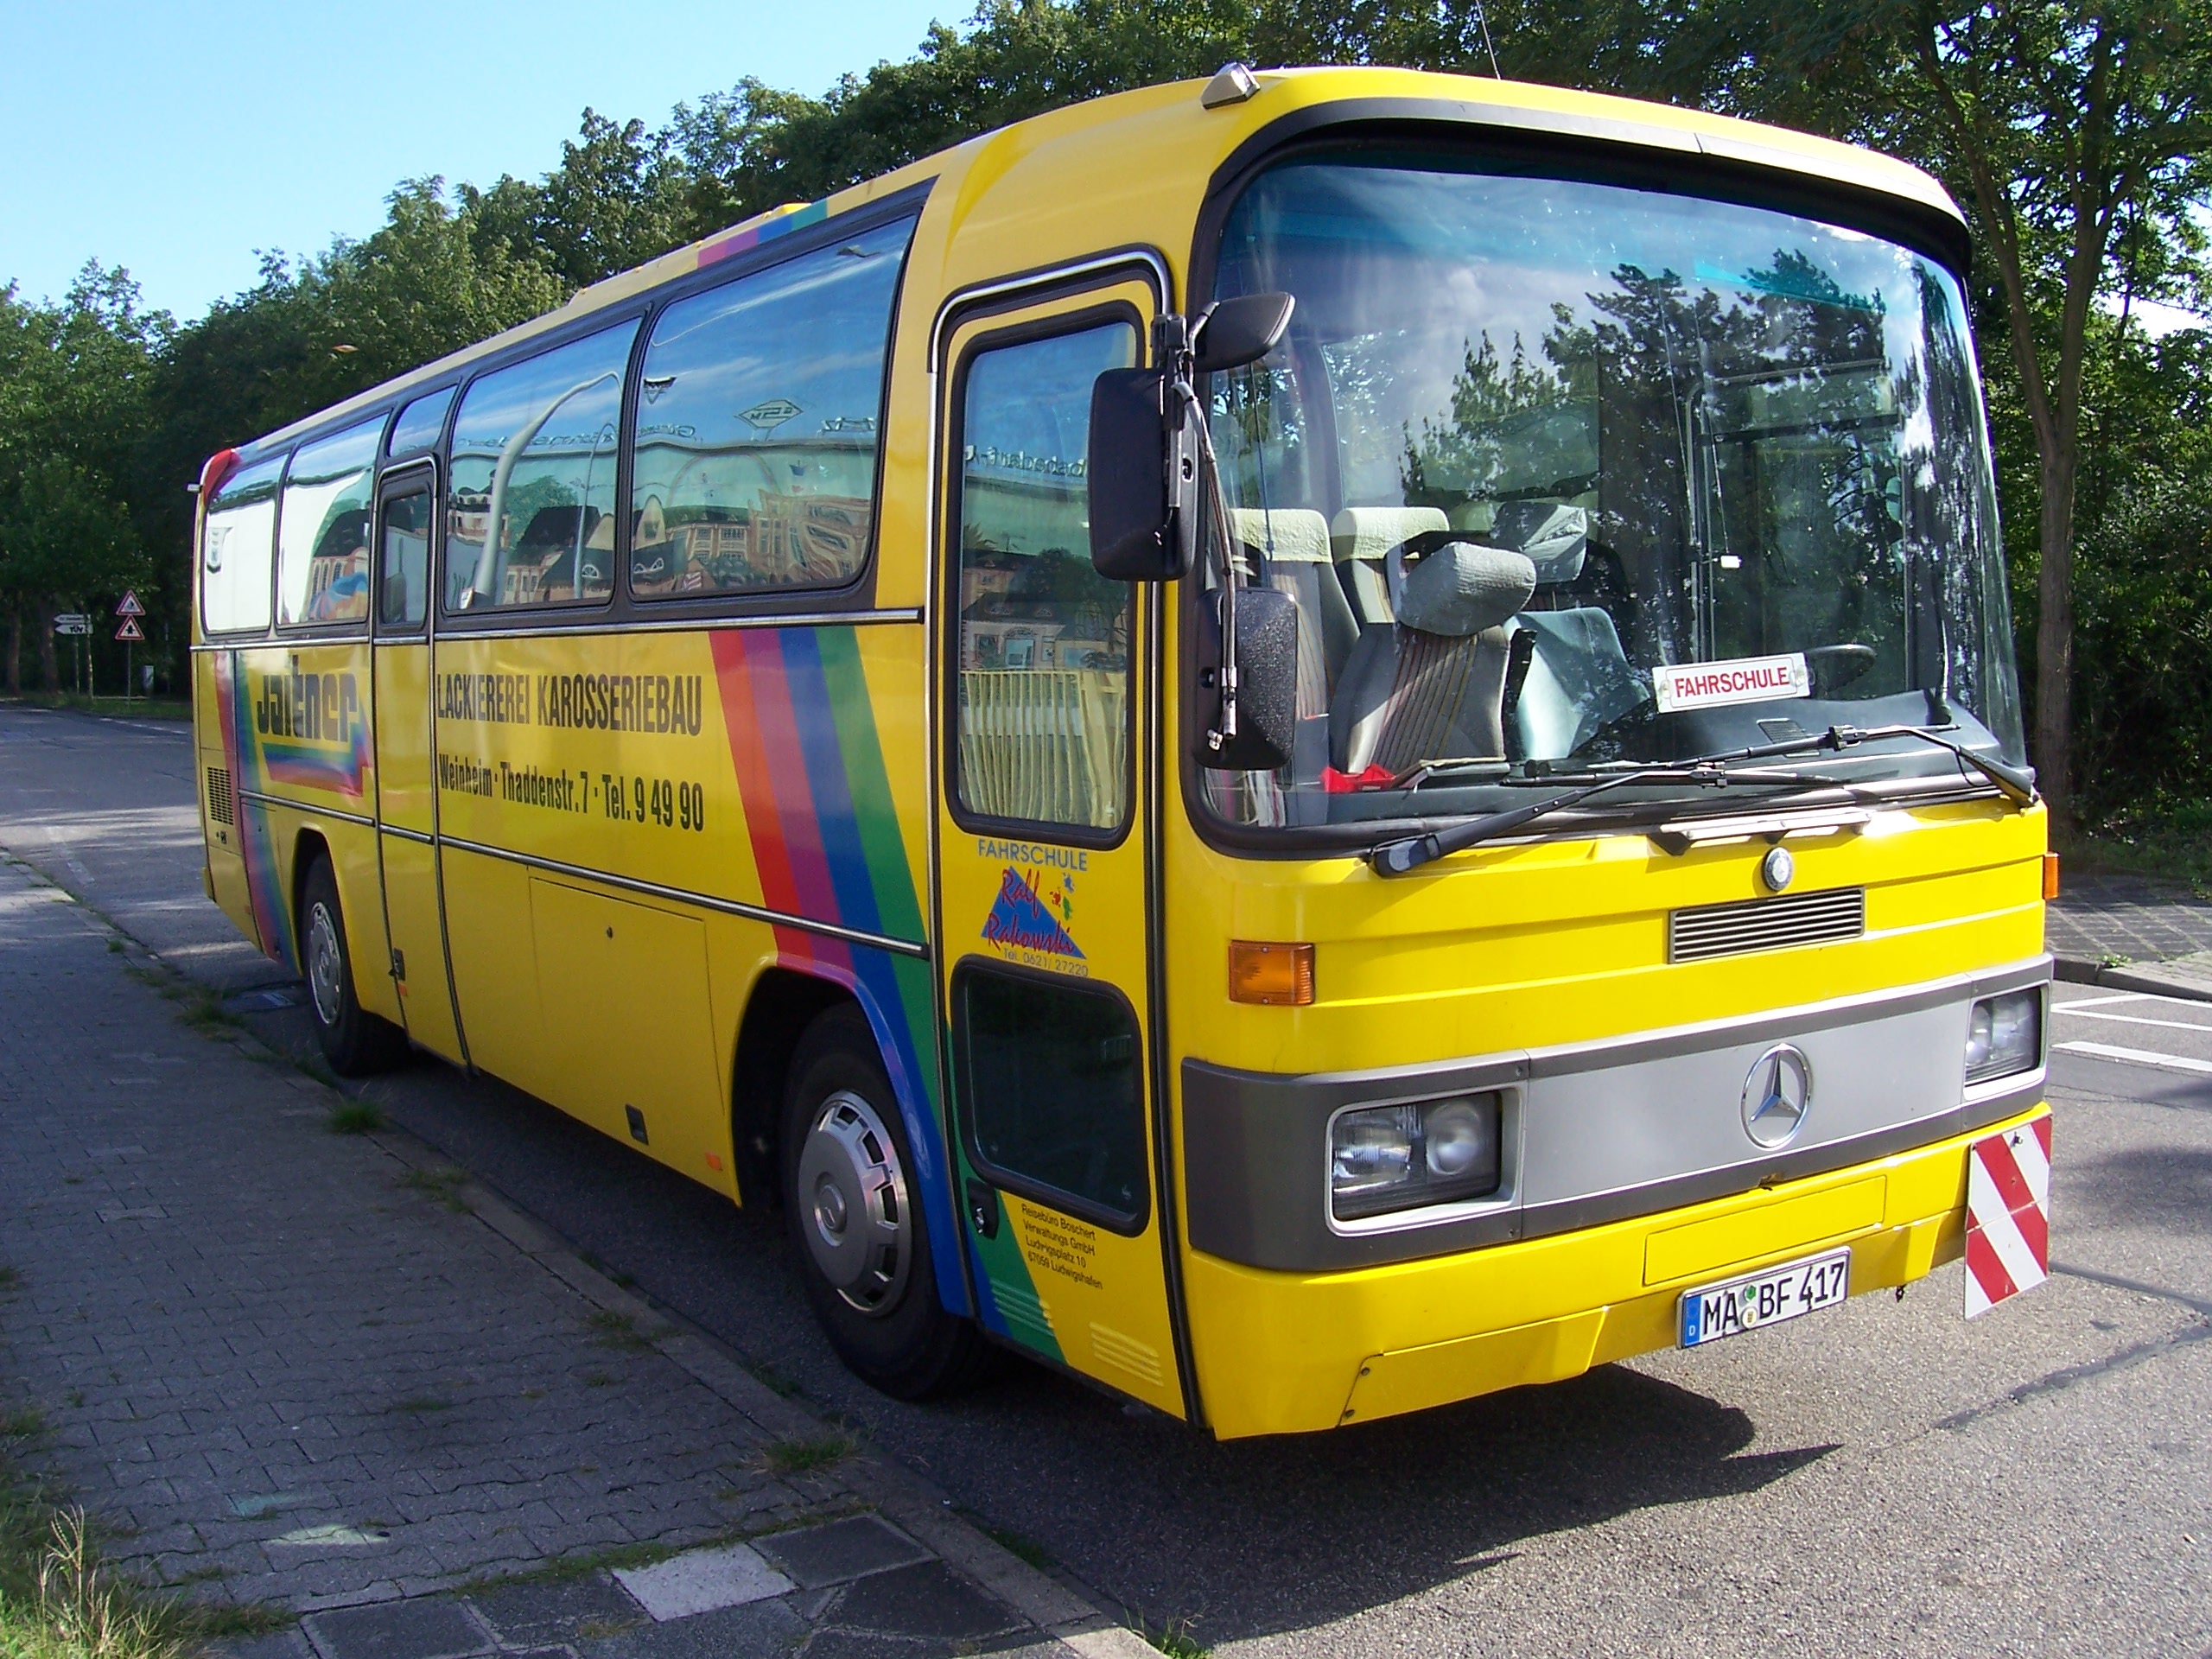 File:Mercedes-Benz-O 303 Mannheim 100 7517.jpg